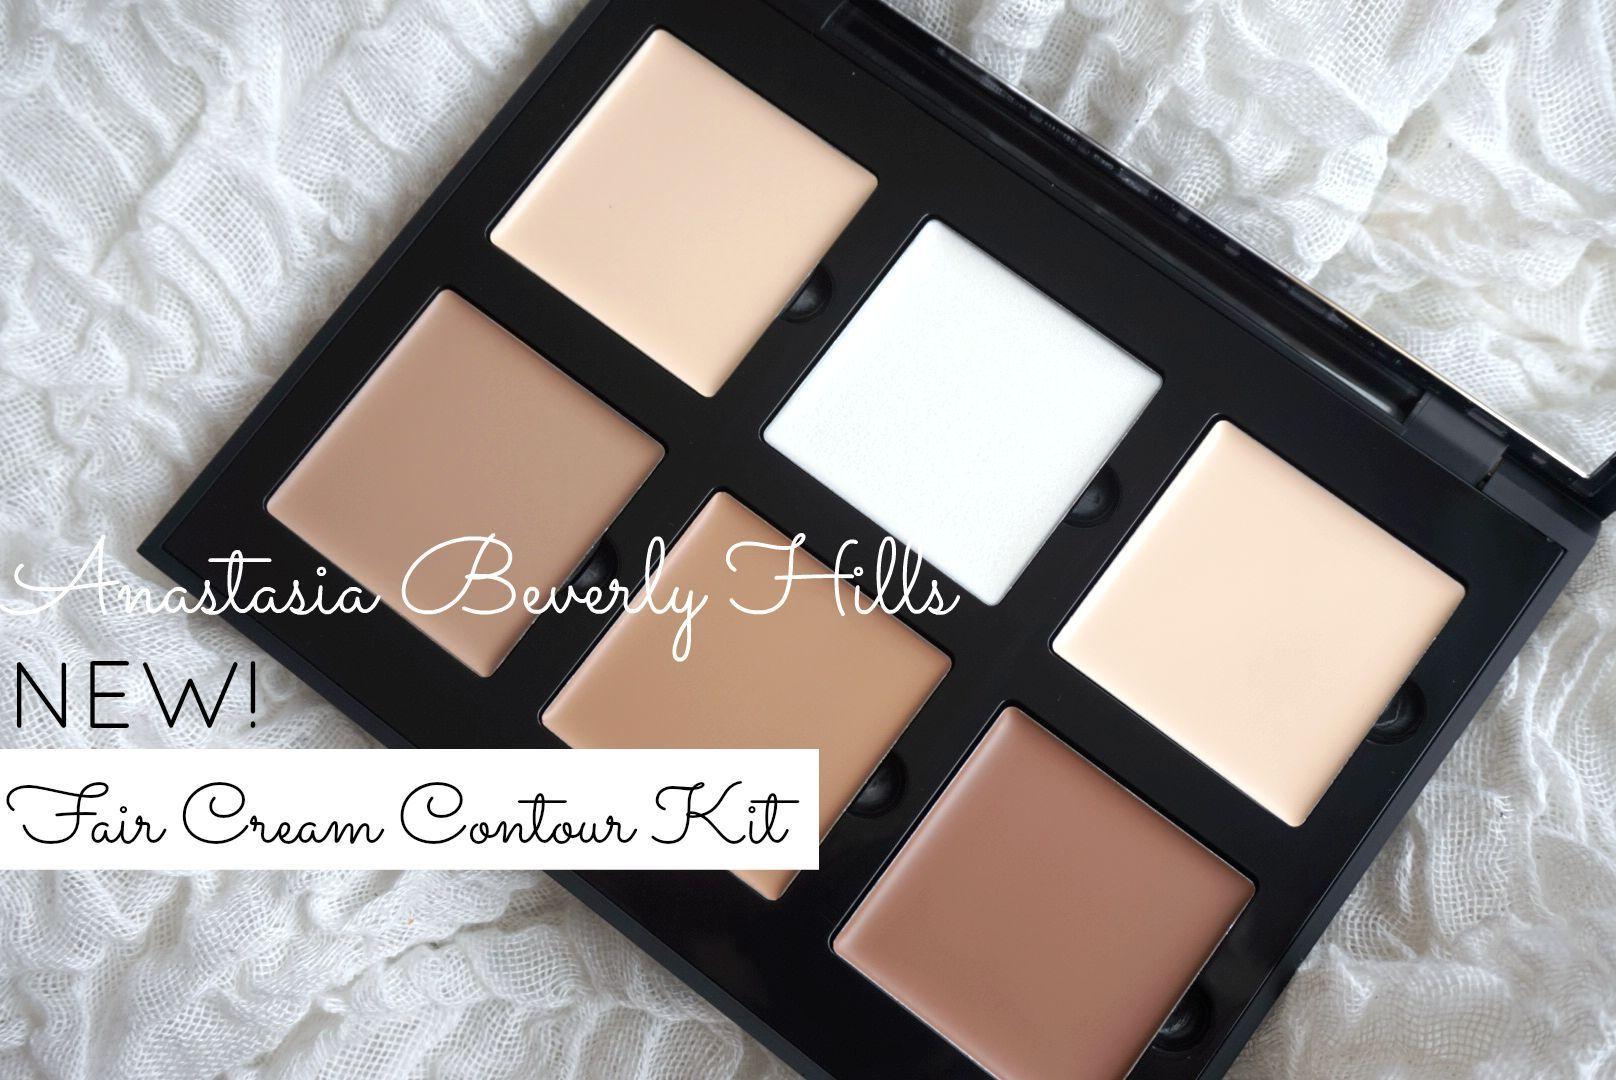 Powder Contour Kit - Light To Medium by Anastasia Beverly Hills #18